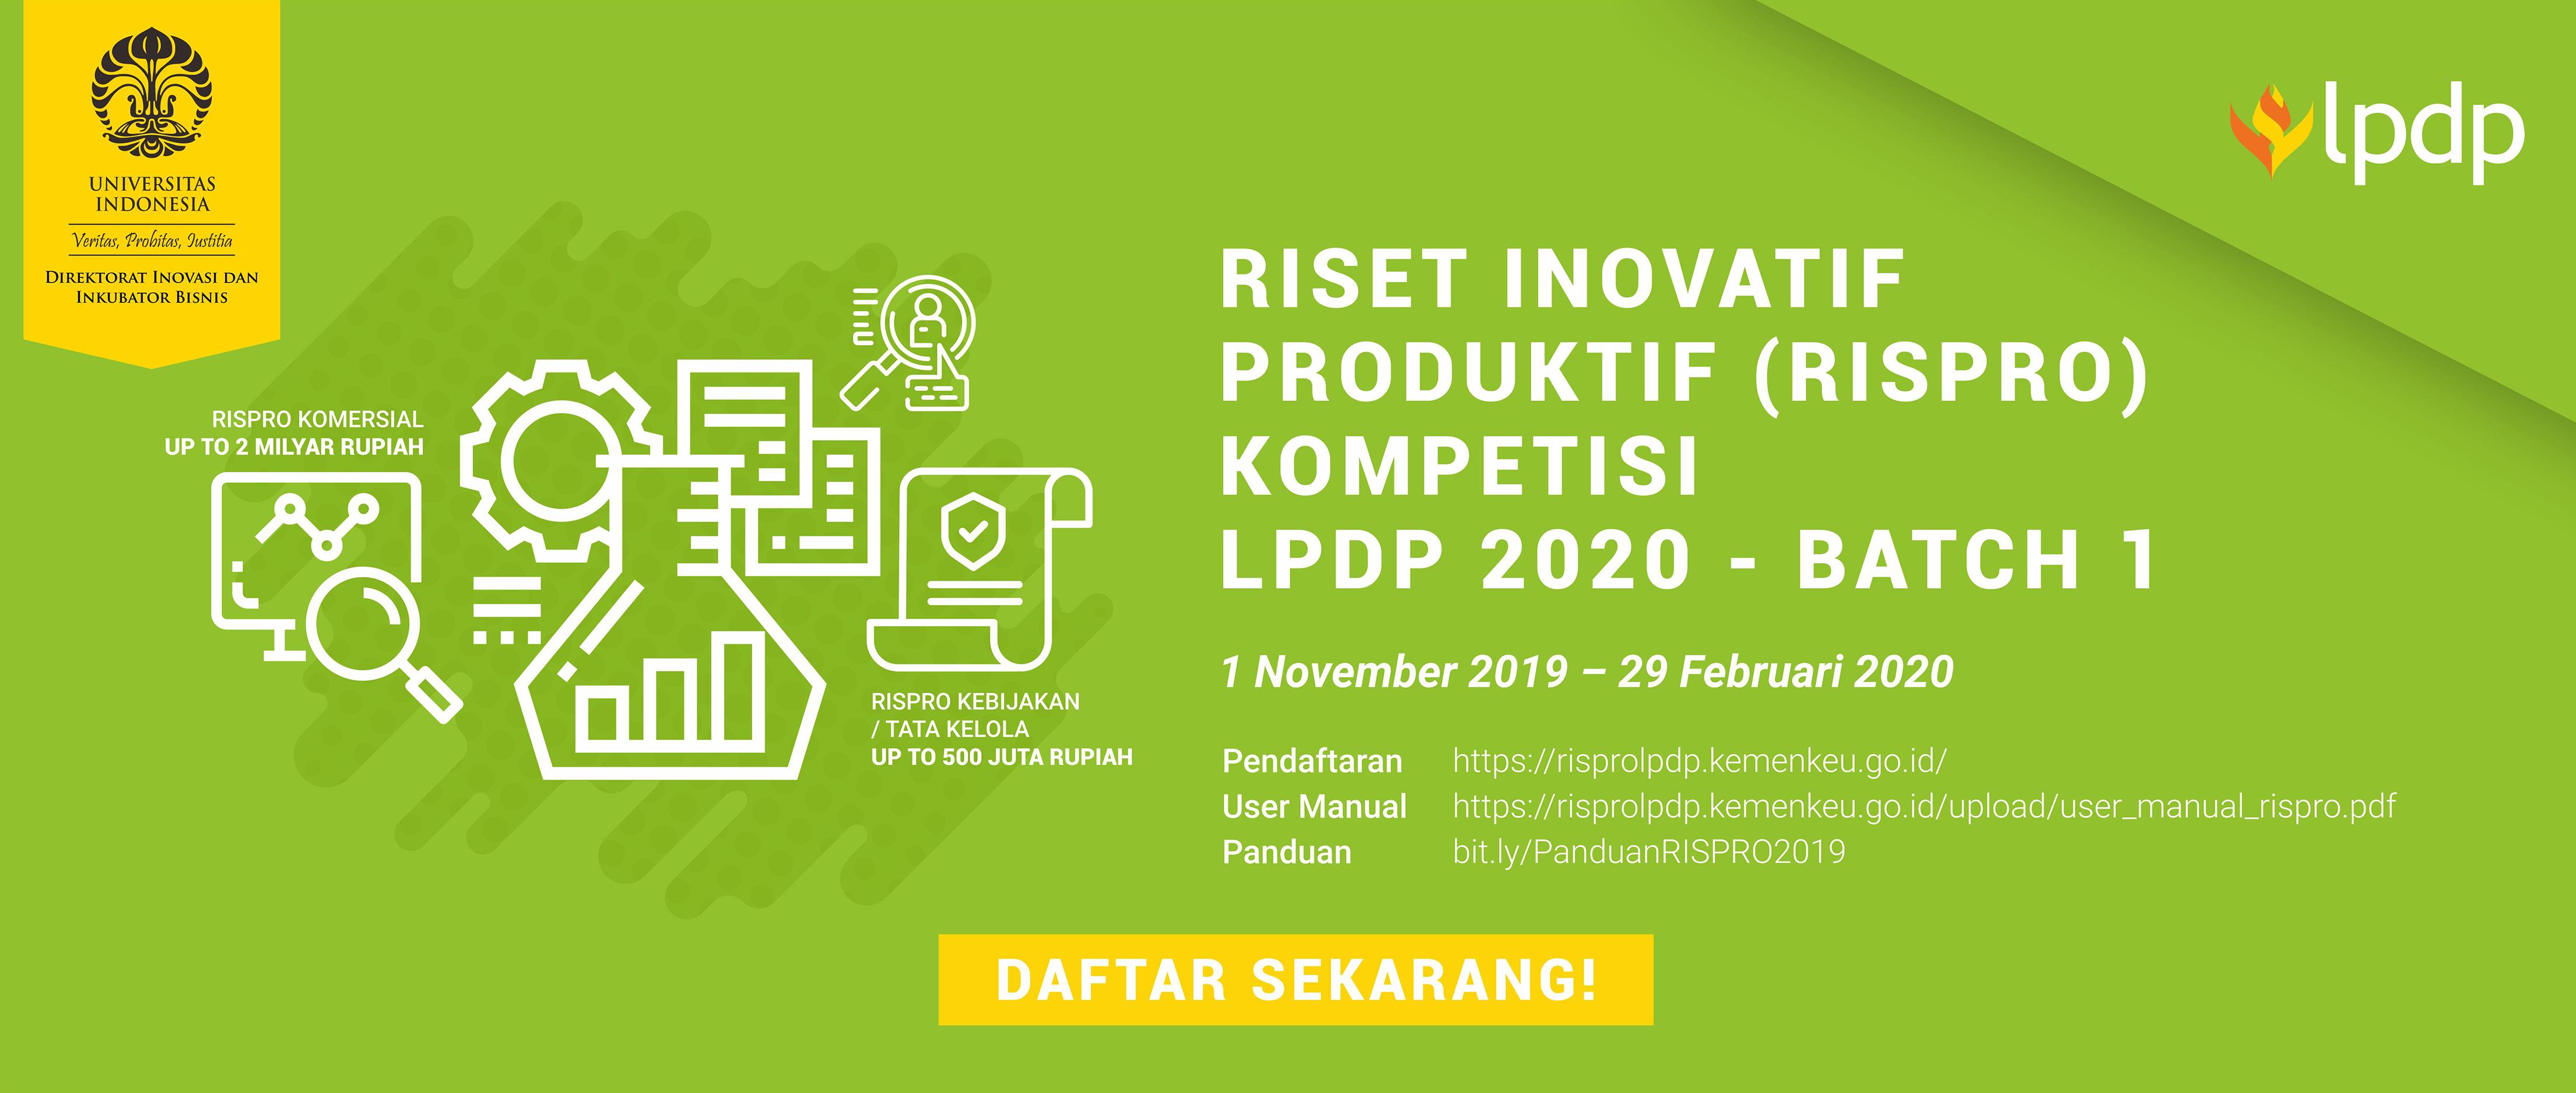 Rispro-2020-Slider